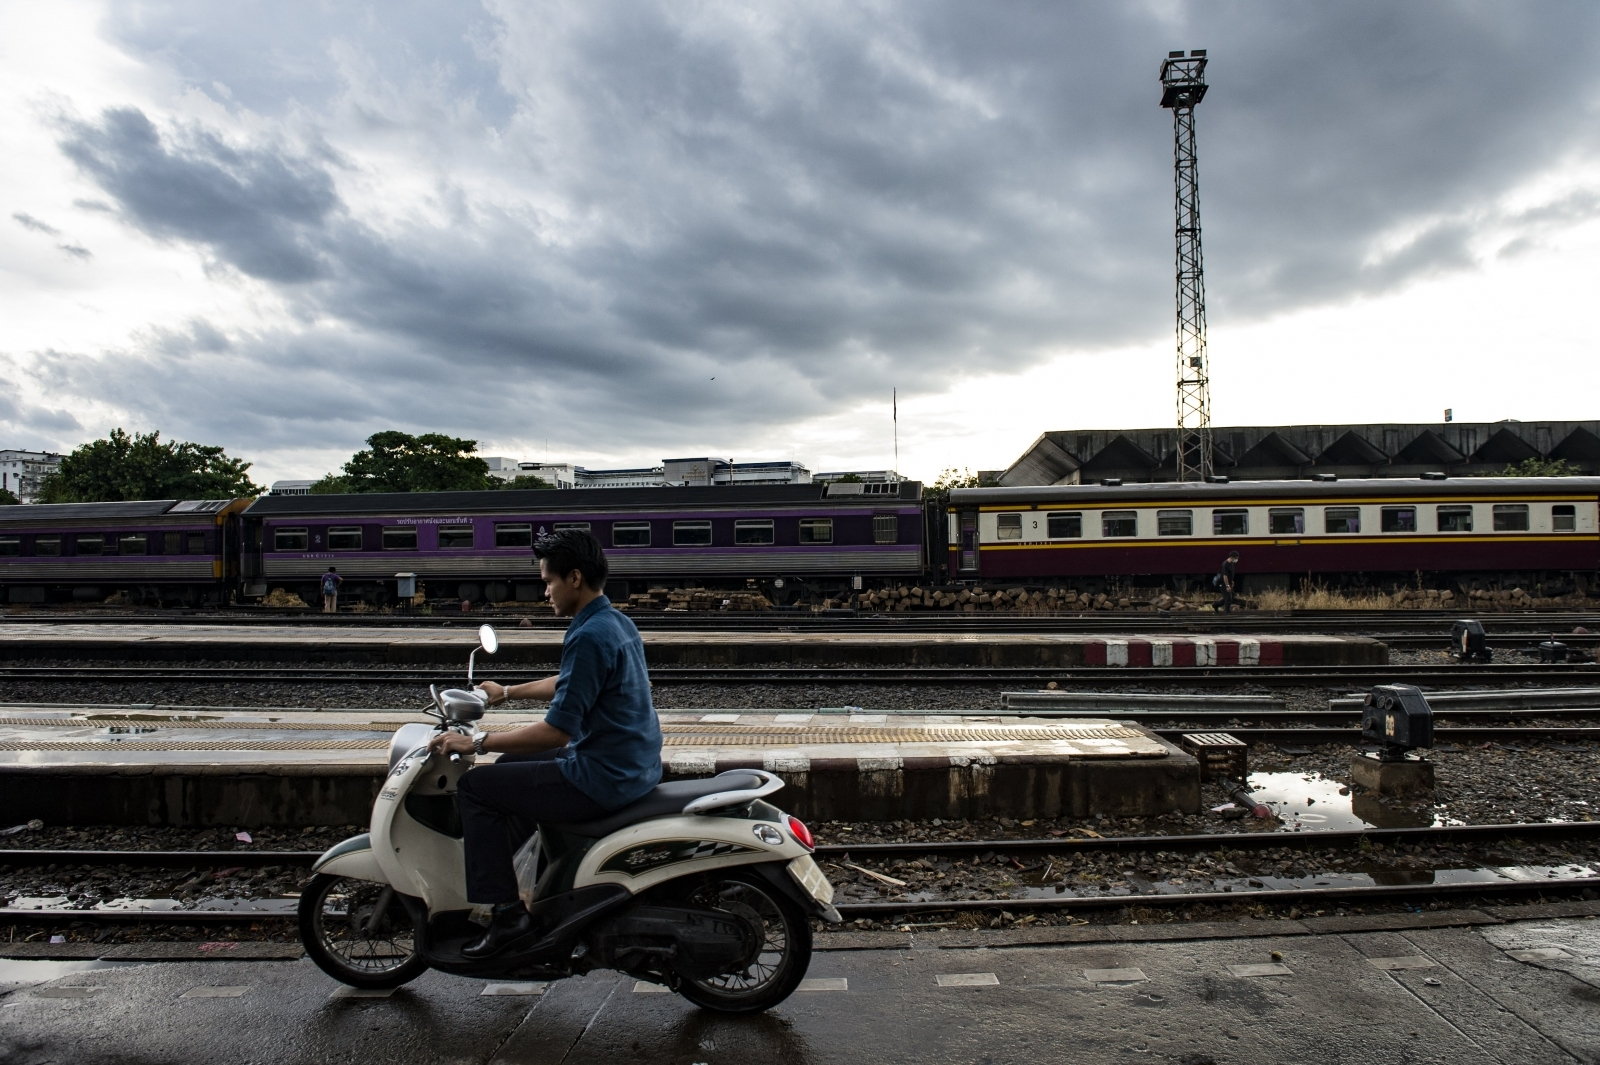 Woman posing for selfie on Bangkok train tracks killed